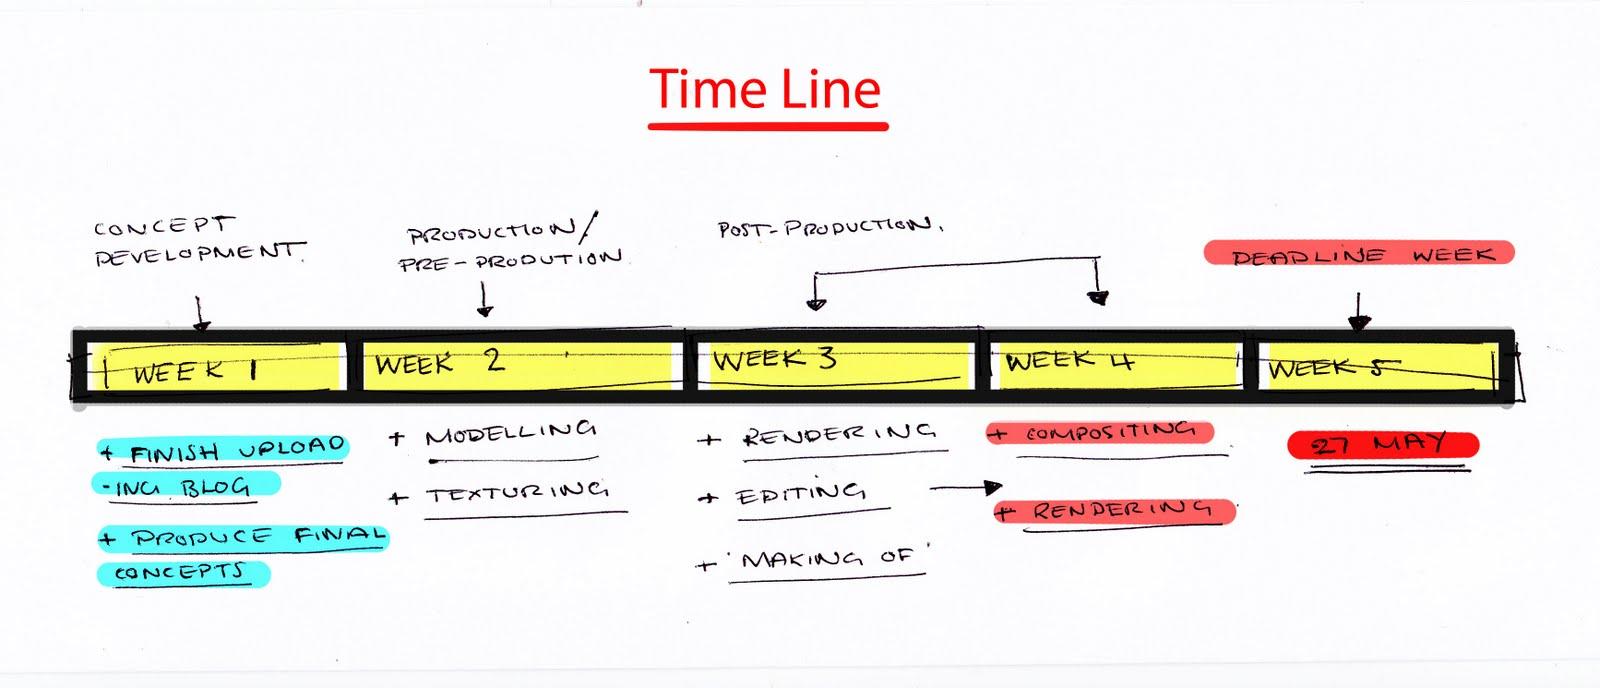 Project Timeline Template Project timeline